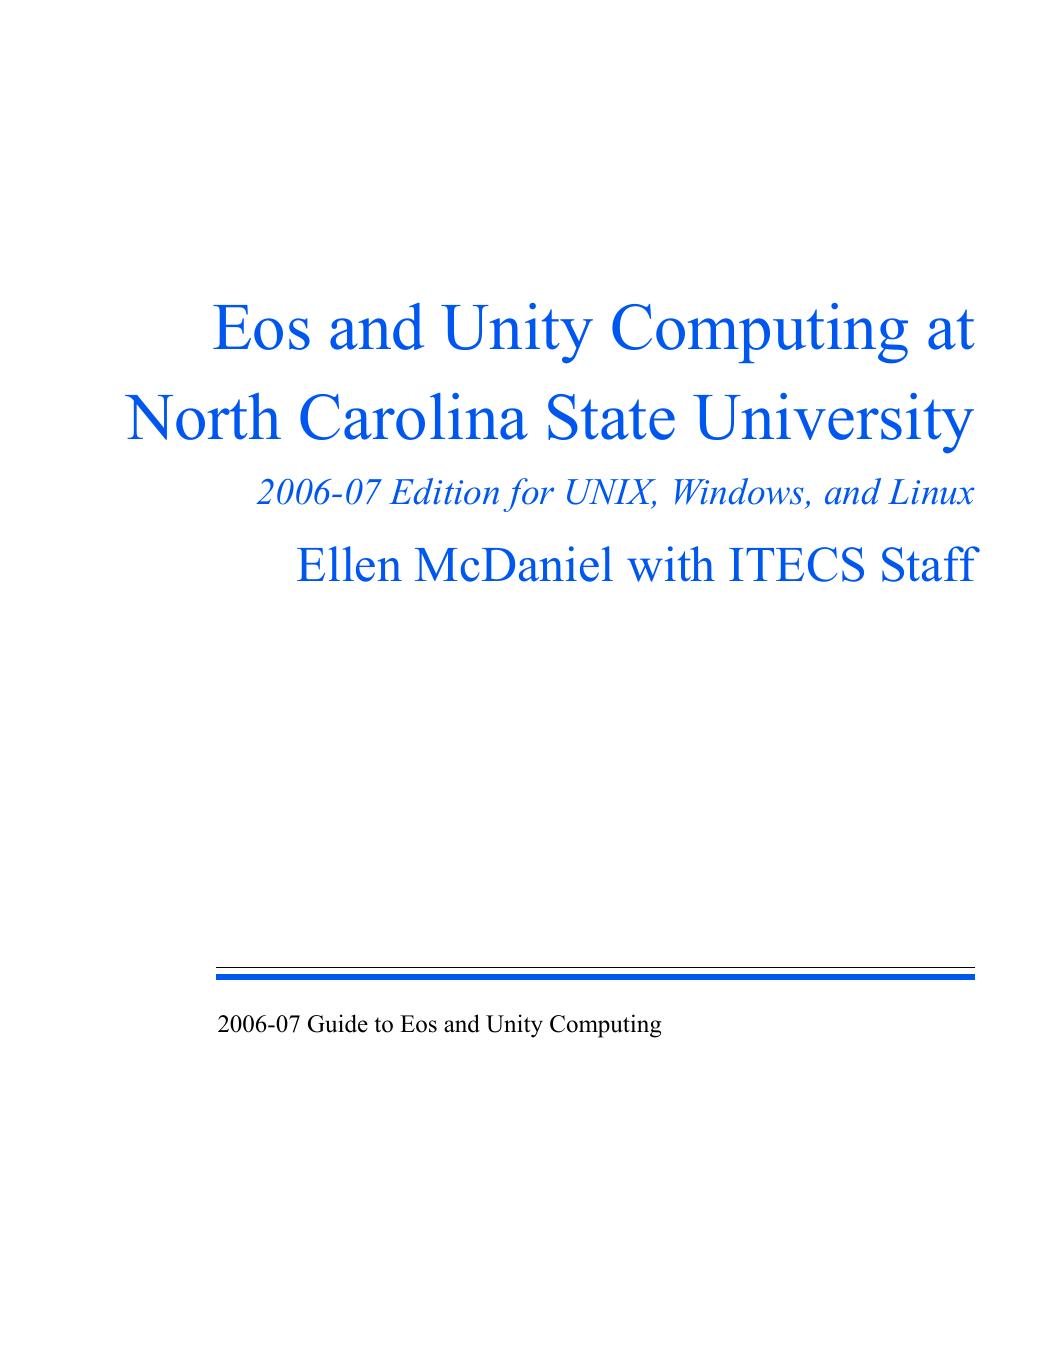 Eos and Unity Computing at North Carolina State University